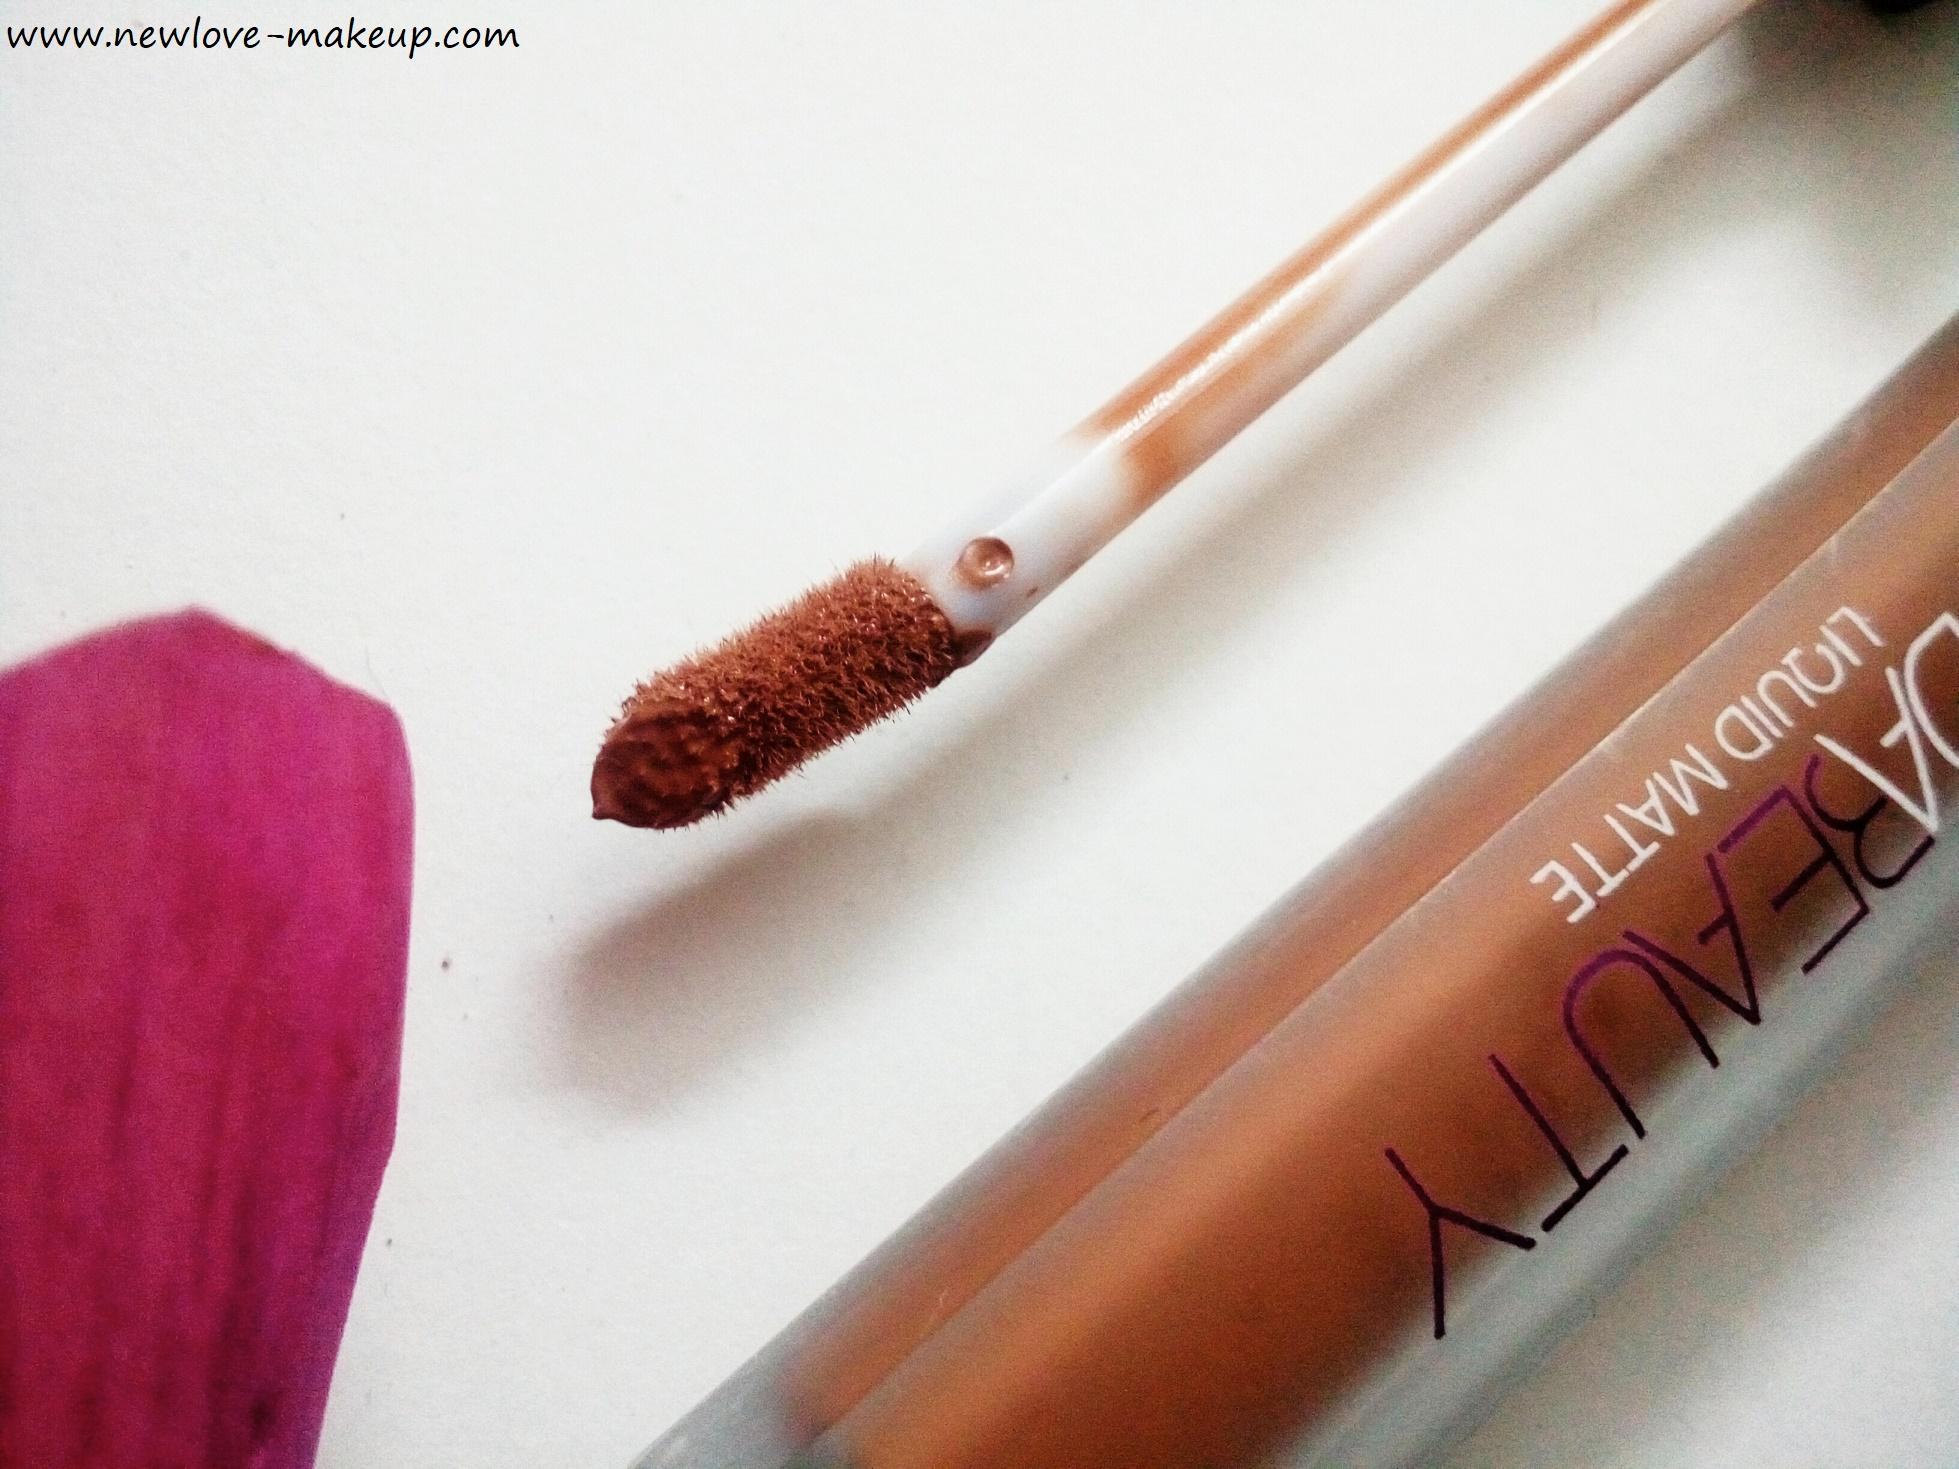 Huda Beauty Liquid Lipsticks Trendsetter, Video Star Review, Swatches